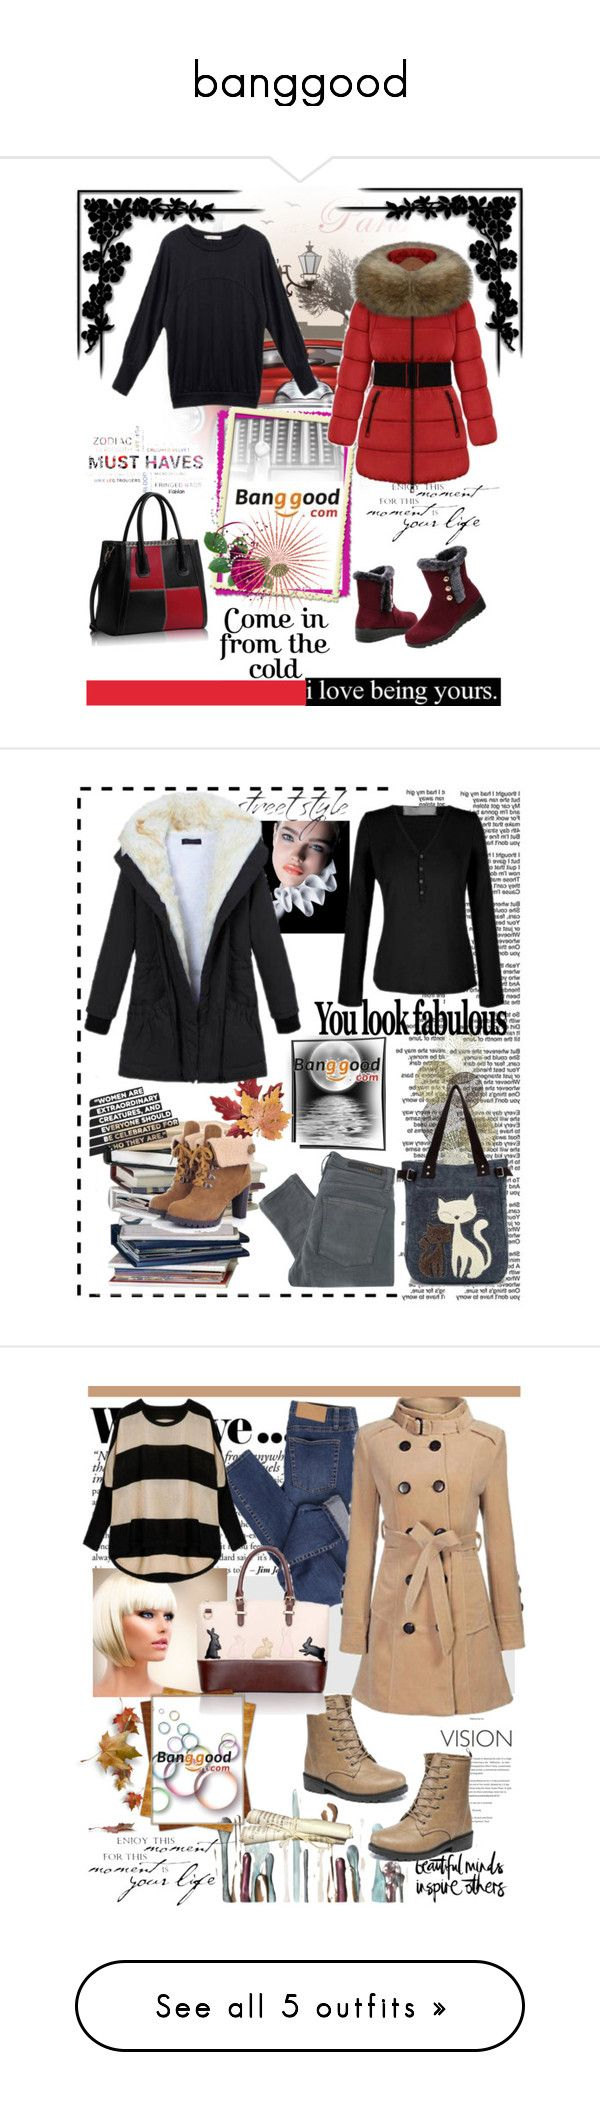 """banggood"" by amelakafedic ❤ liked on Polyvore featuring Emilio Pucci, Winter, nice, Boots, BangGood, Amira, Universal Lighting and Decor, Nobody Denim, Croft & Barrow and Zara"